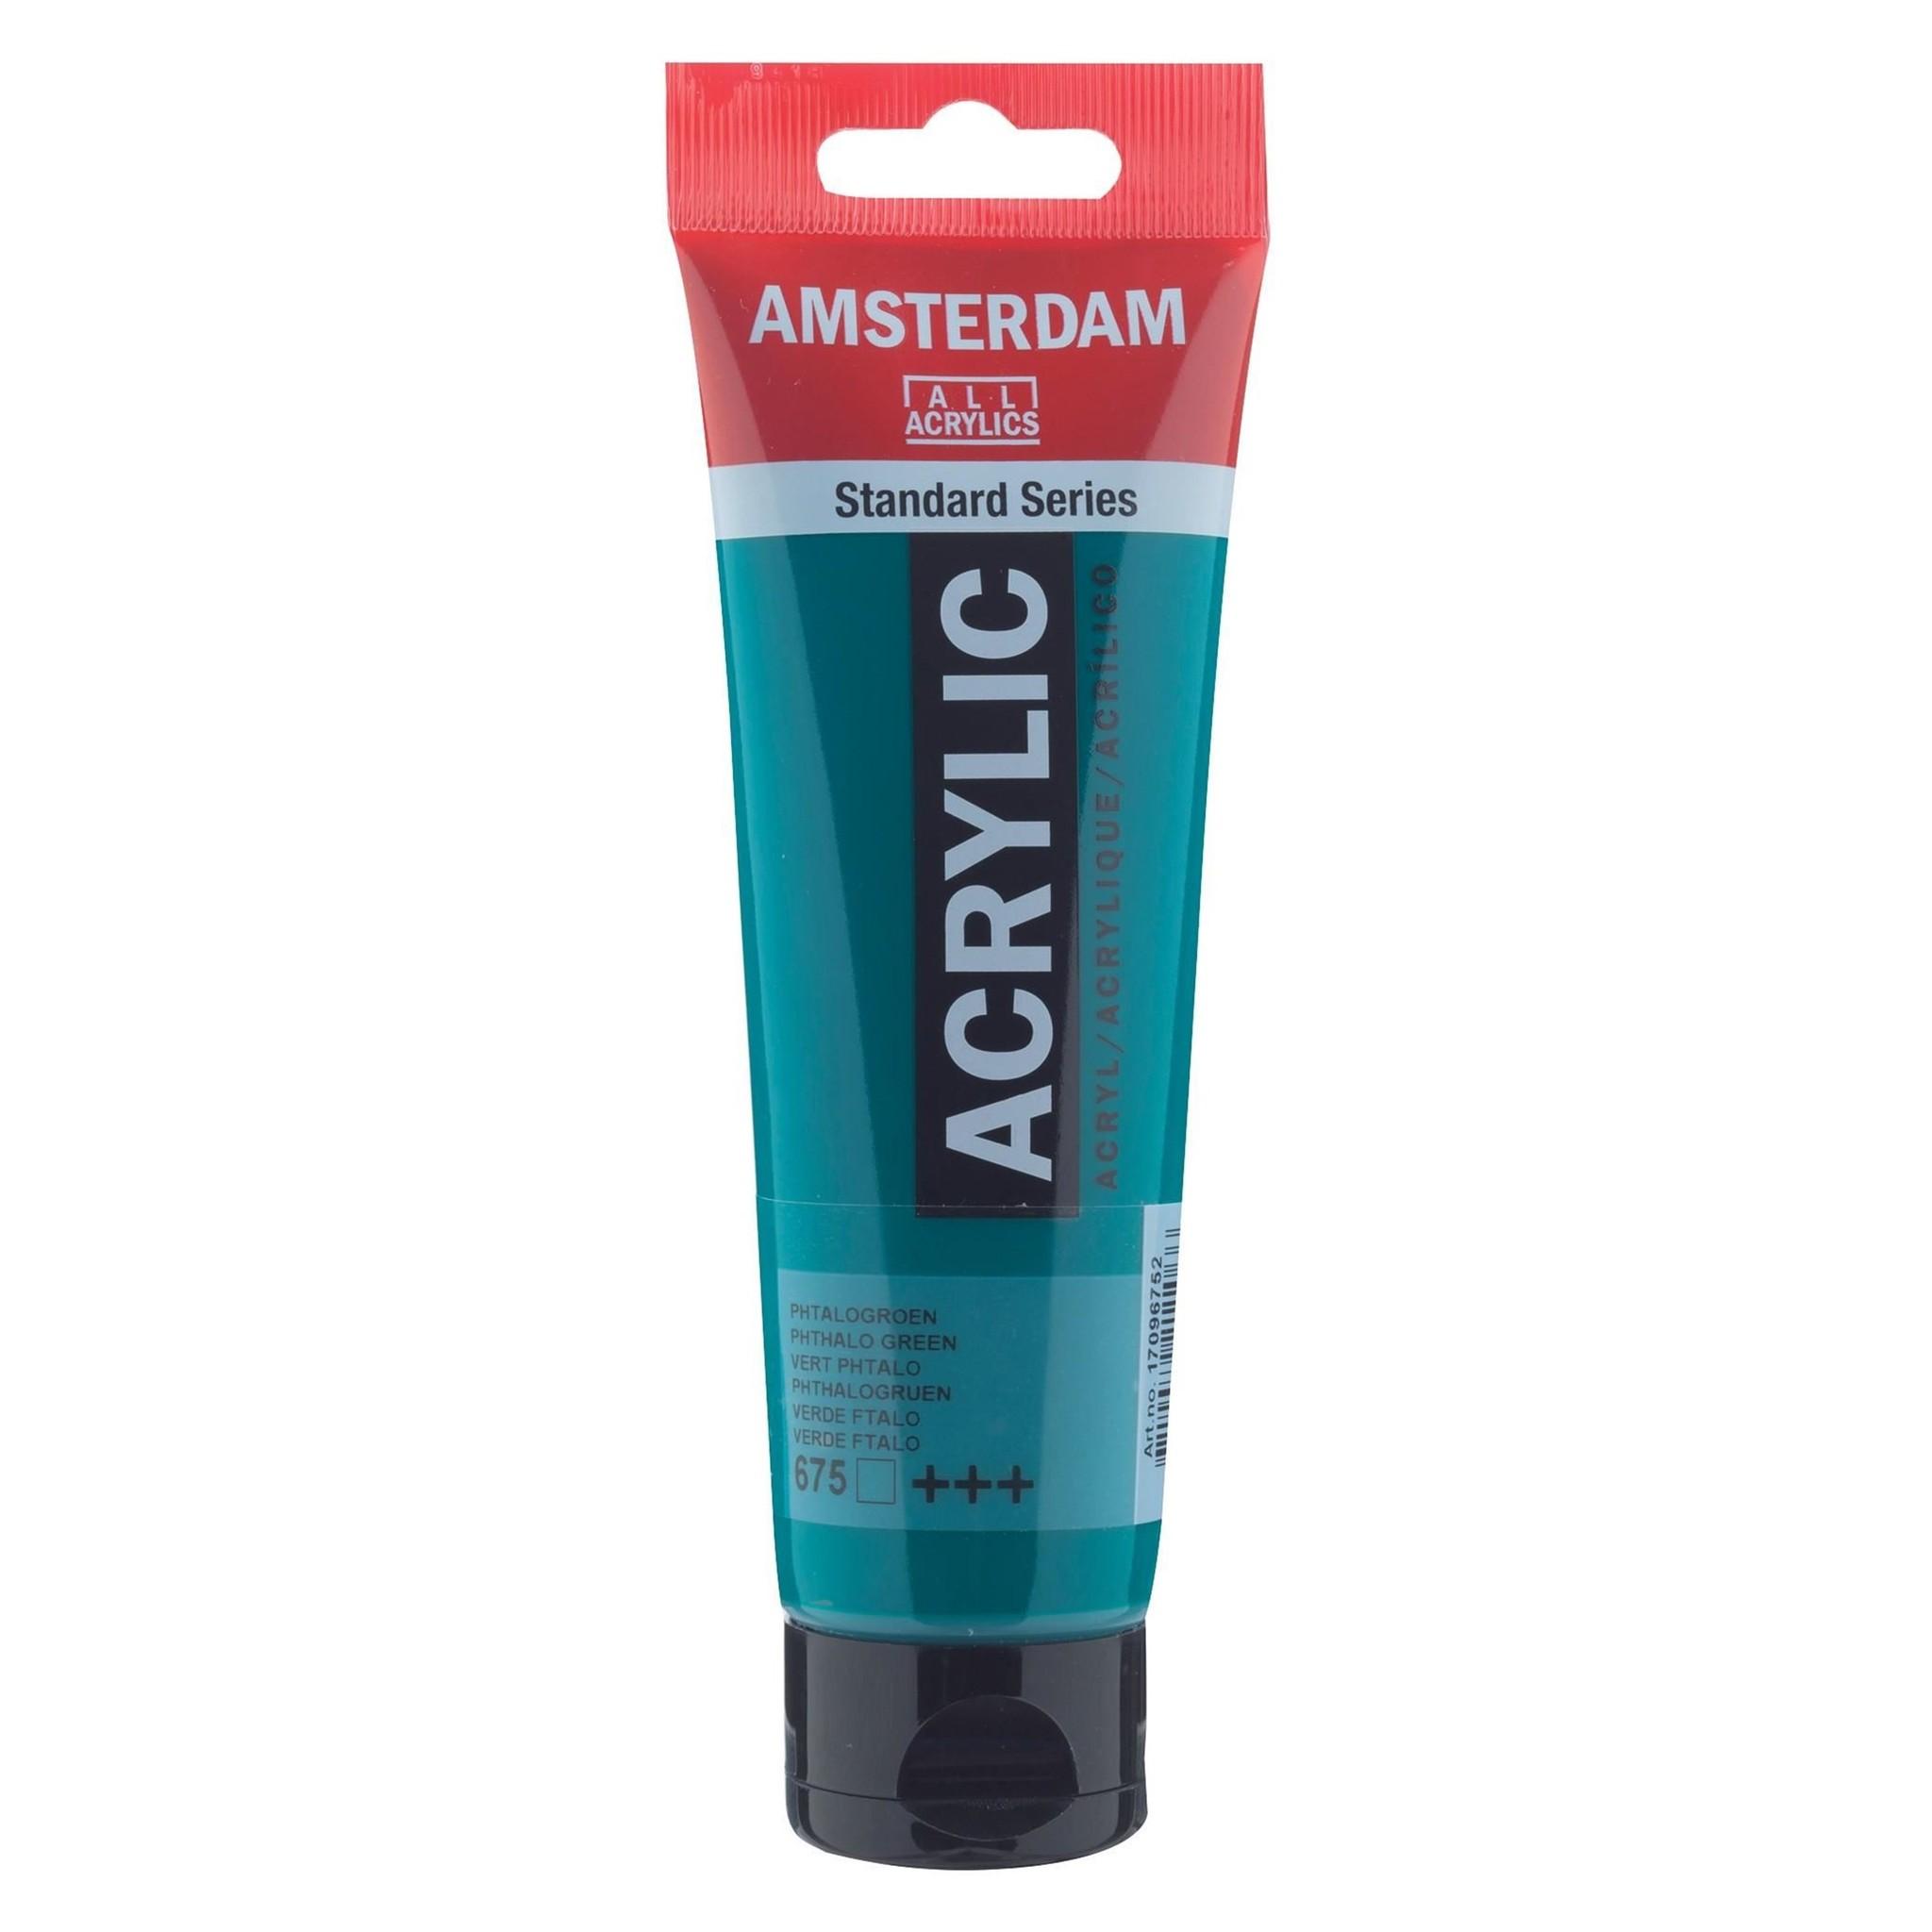 AMSTERDAM ACRYLIC 4OZ PHTHALO GREEN